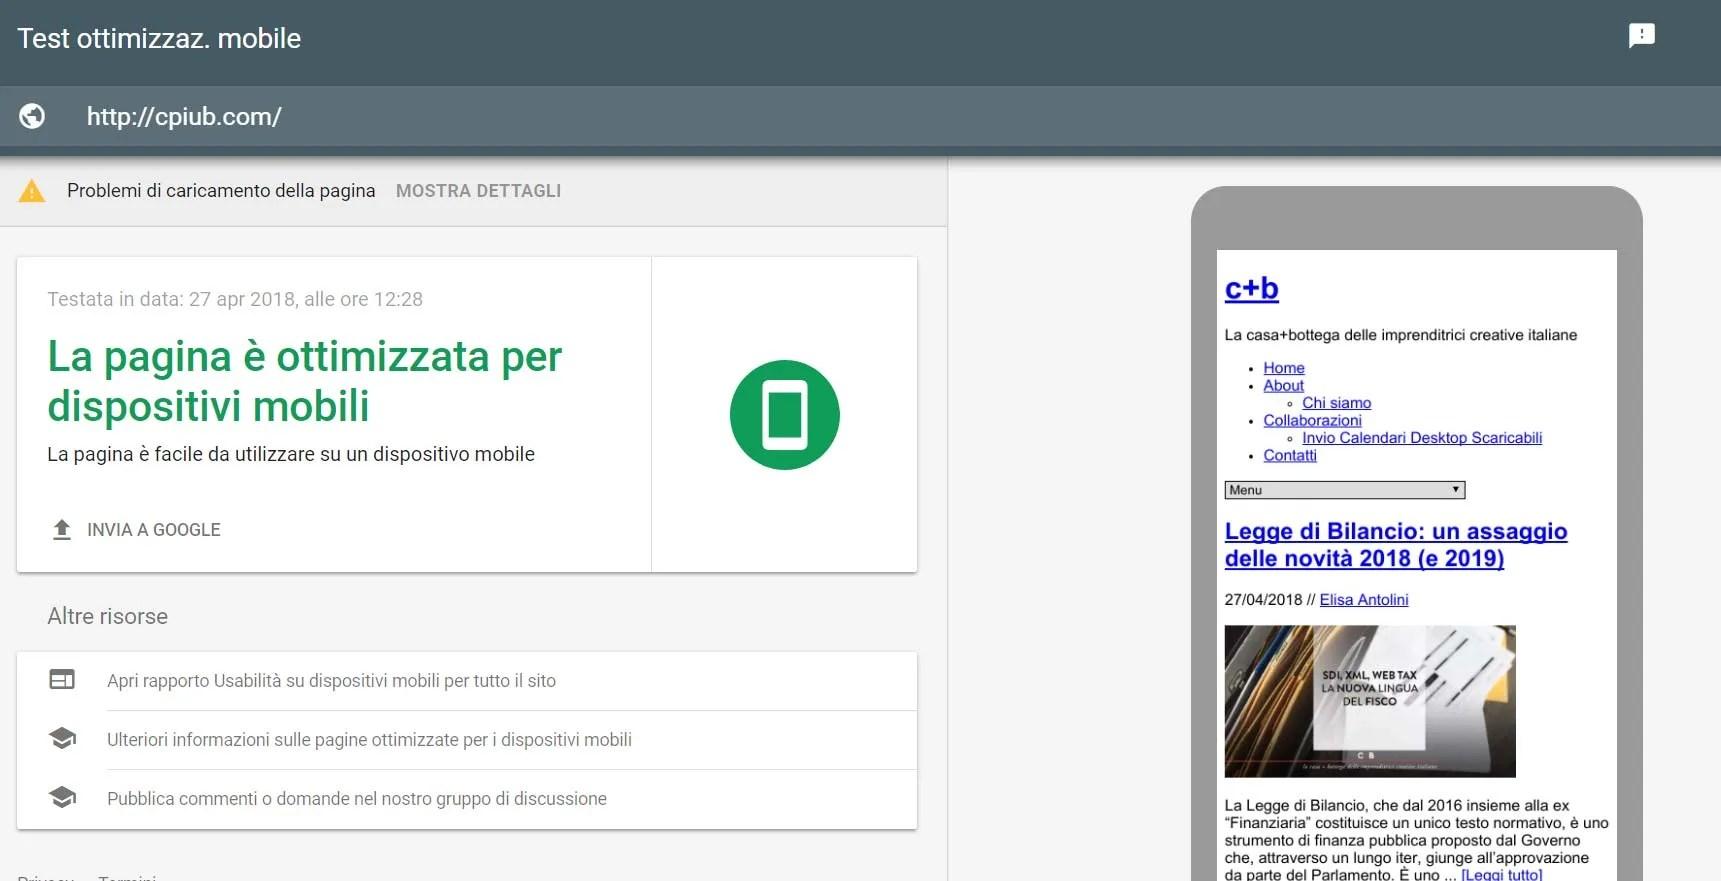 sito mobile friendly test